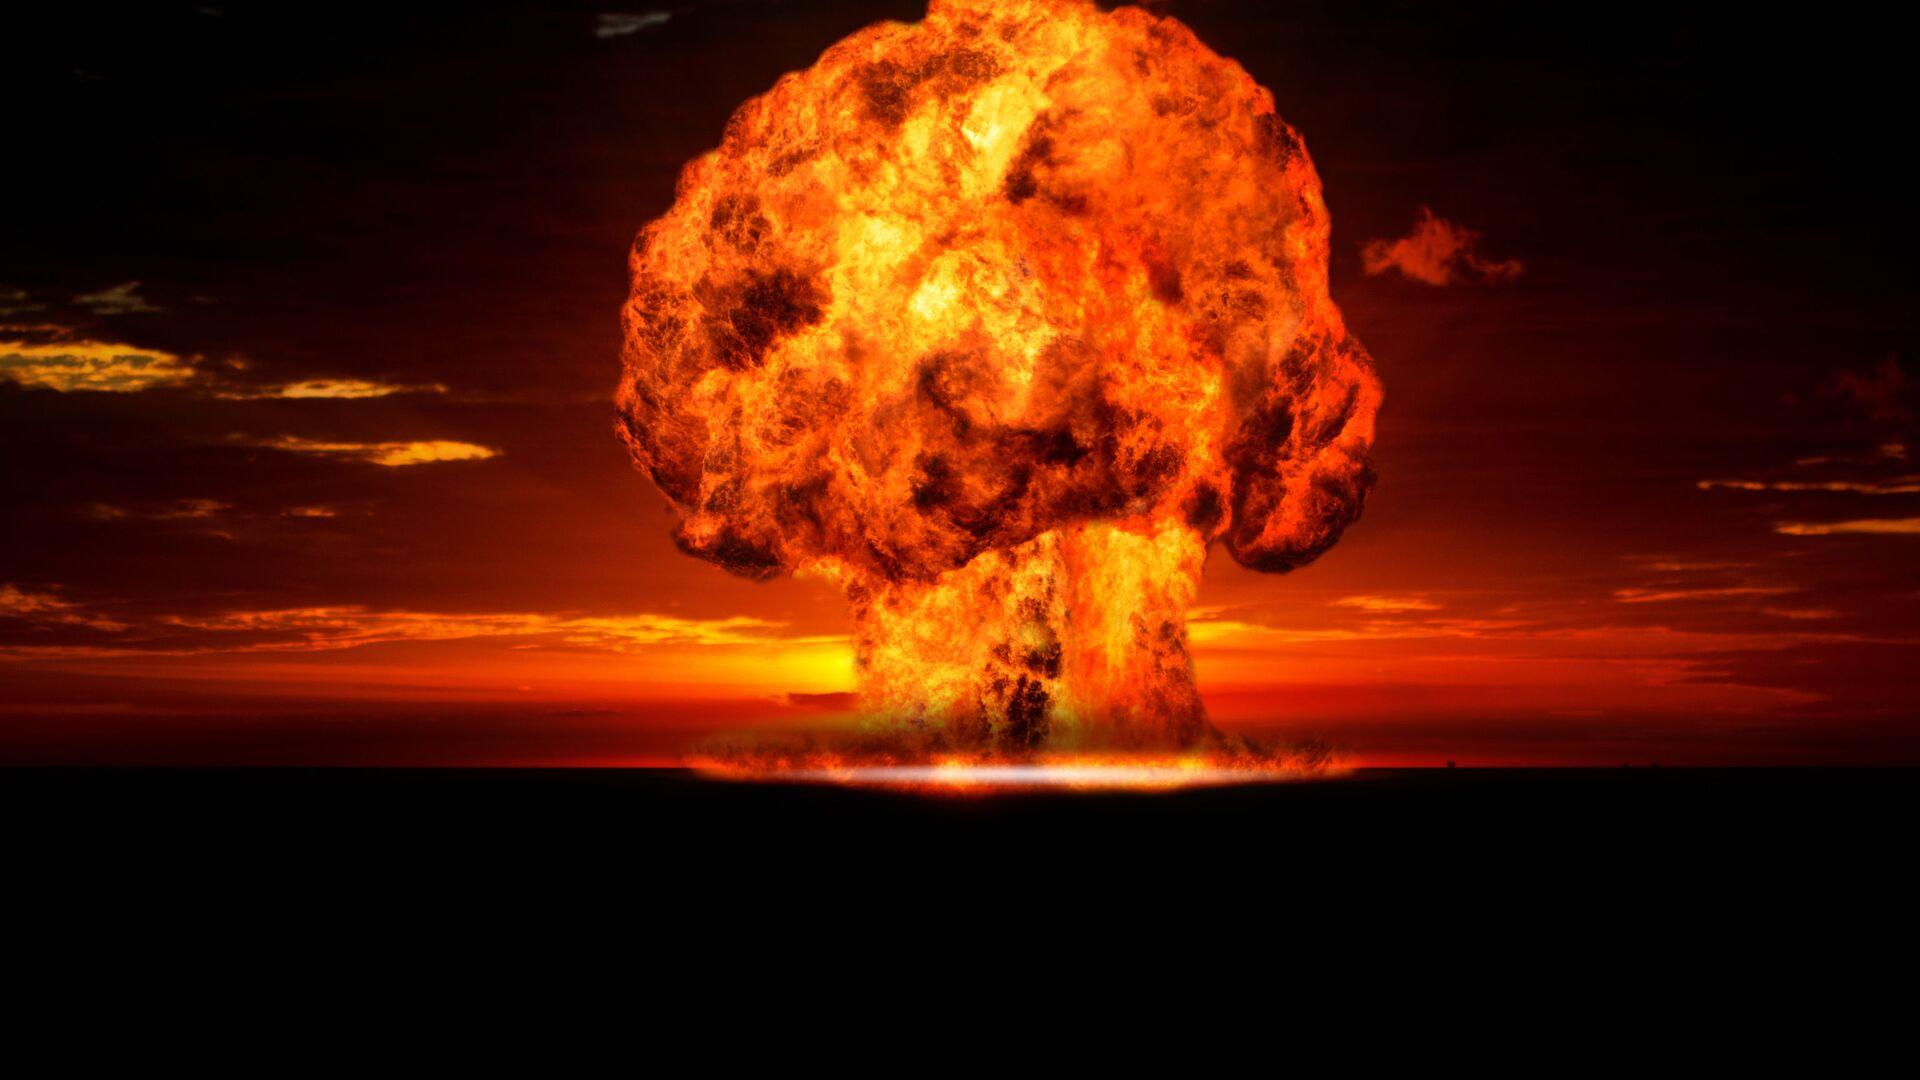 Ядерный взрыв - Sputnik Azərbaycan, 1920, 26.09.2021